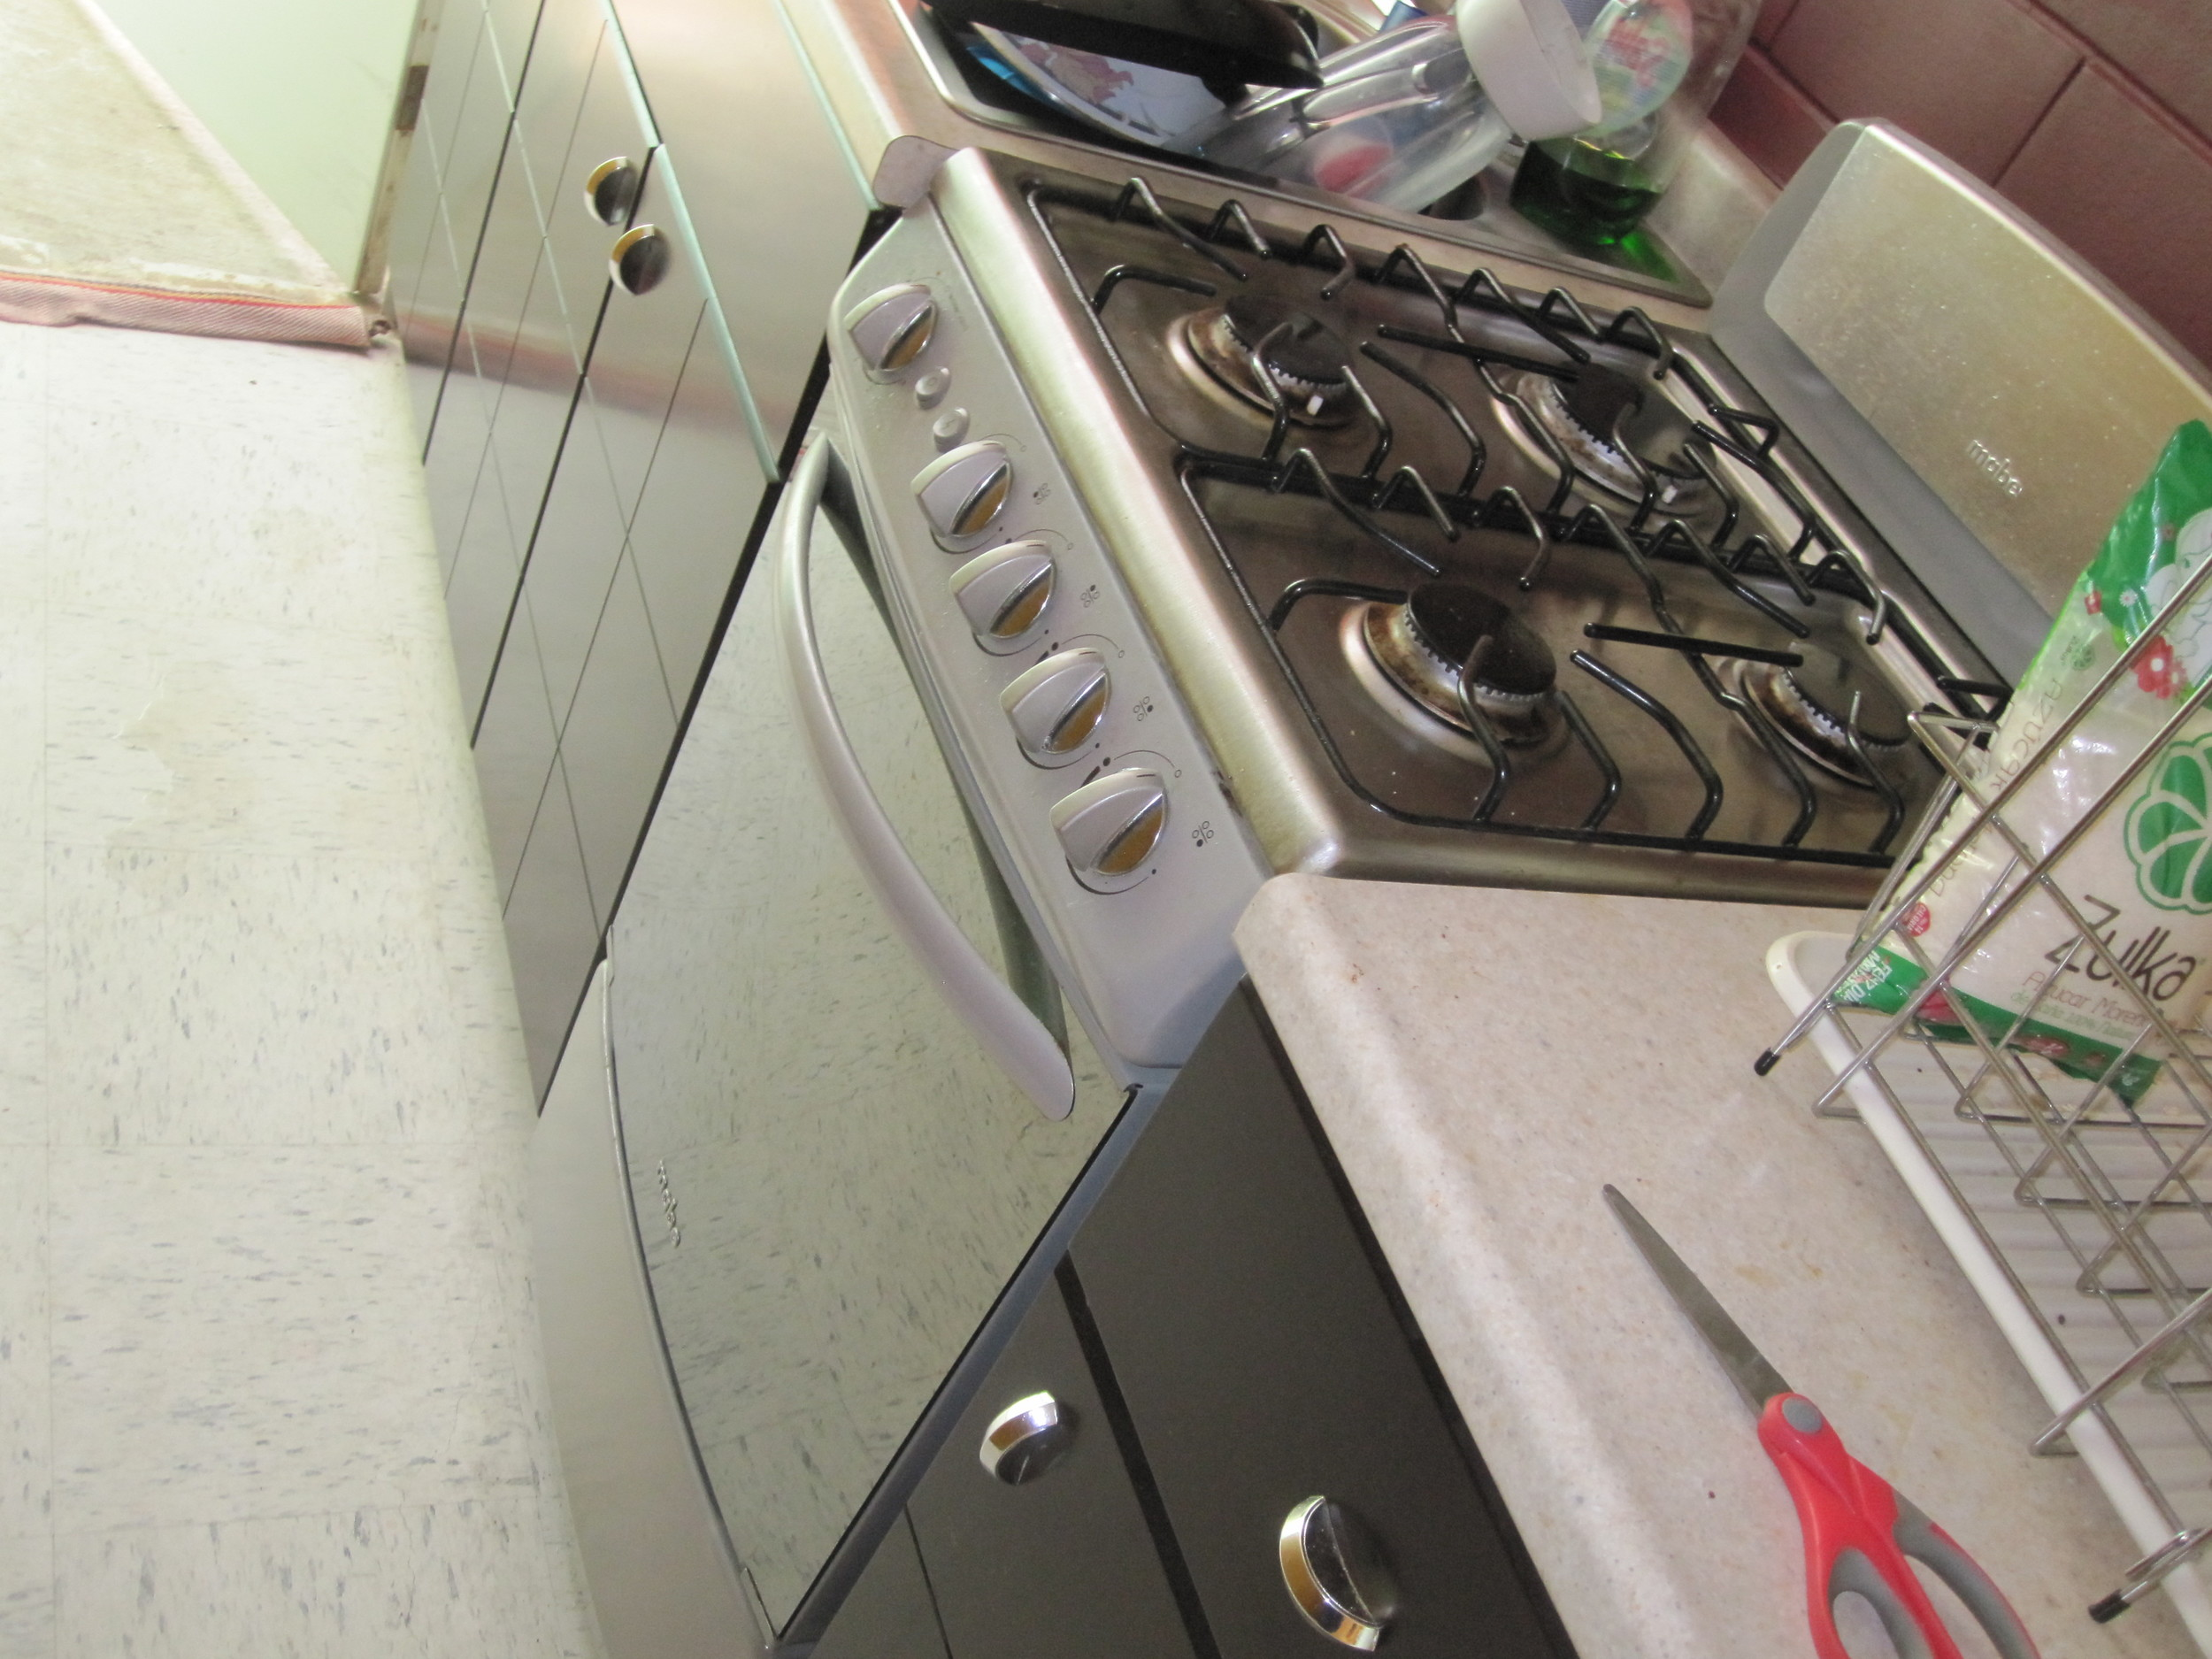 Elder Jason Blanding's apartment: HE HAS A STOVE!